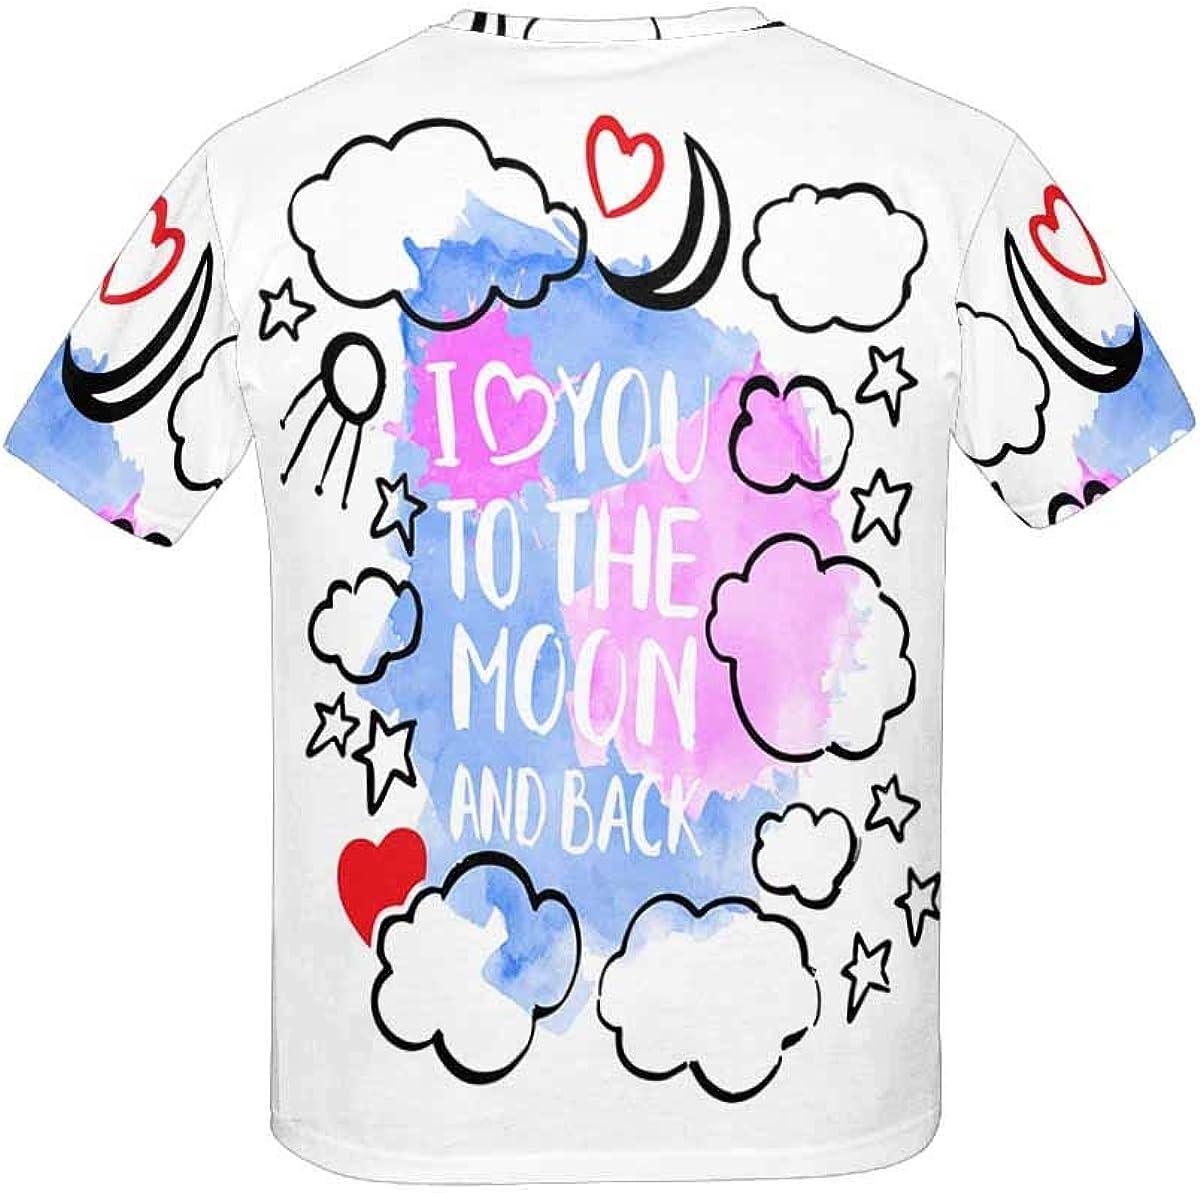 INTERESTPRINT T-Shirt in Youth XS-XL